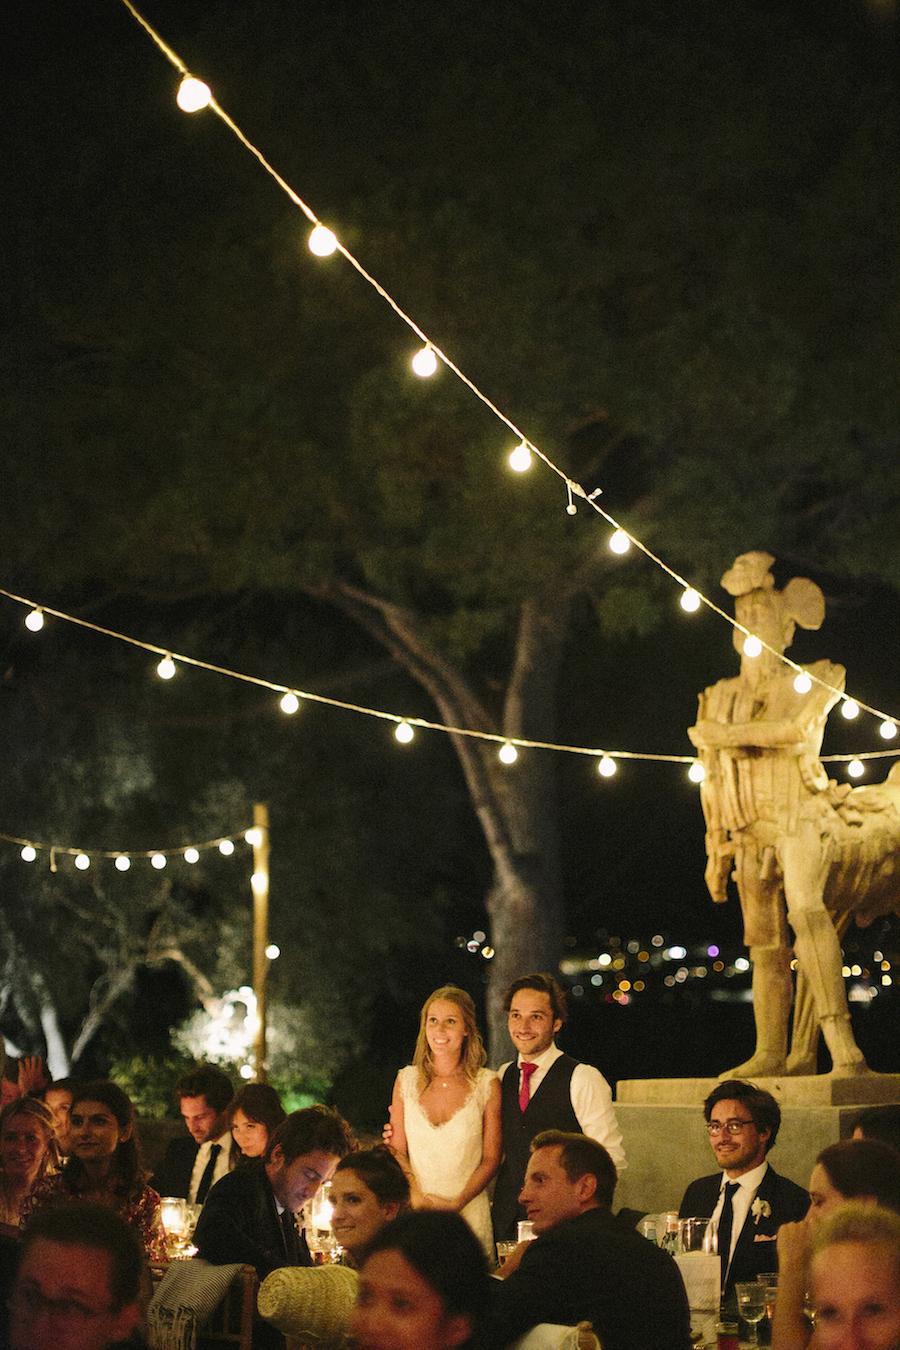 saya-photography-wedding-french-riviera-rustic-antibes-la-bastide-du-roy-130.jpg